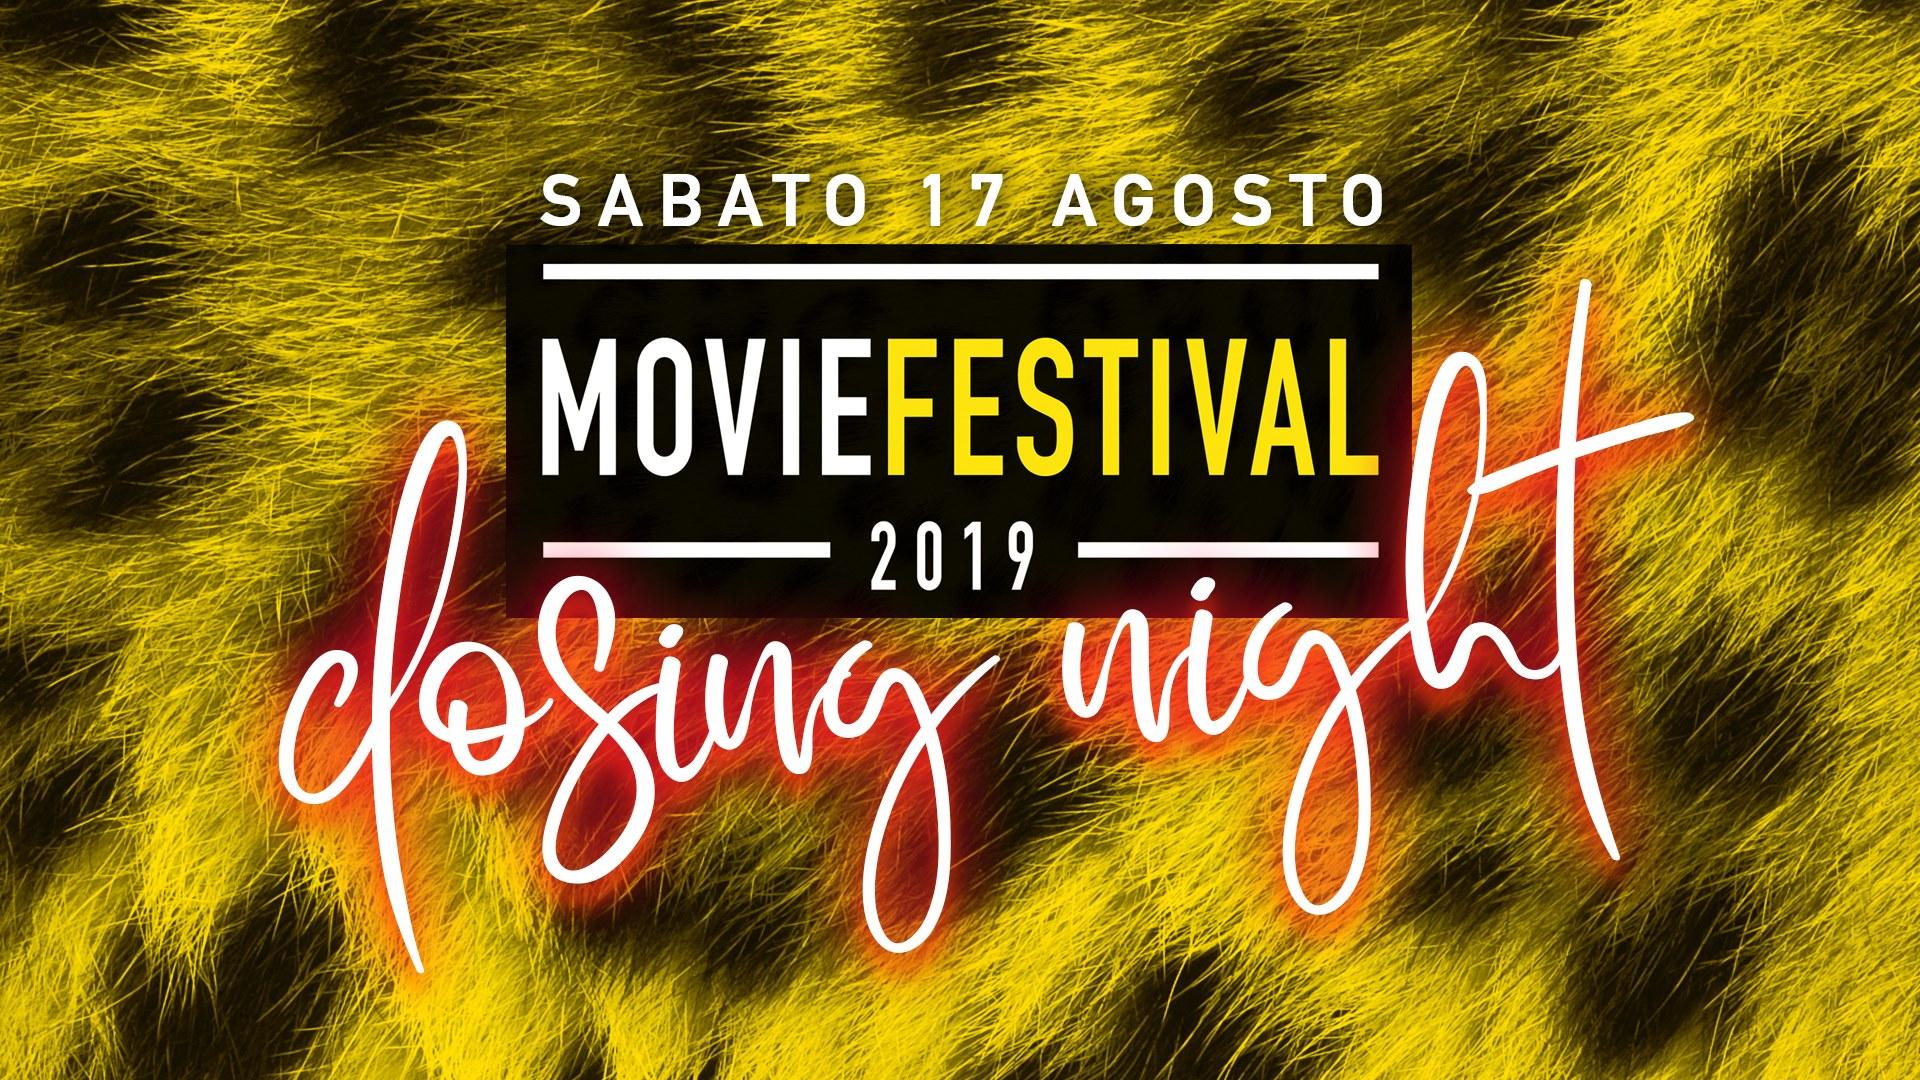 Movie Festival Closing Night